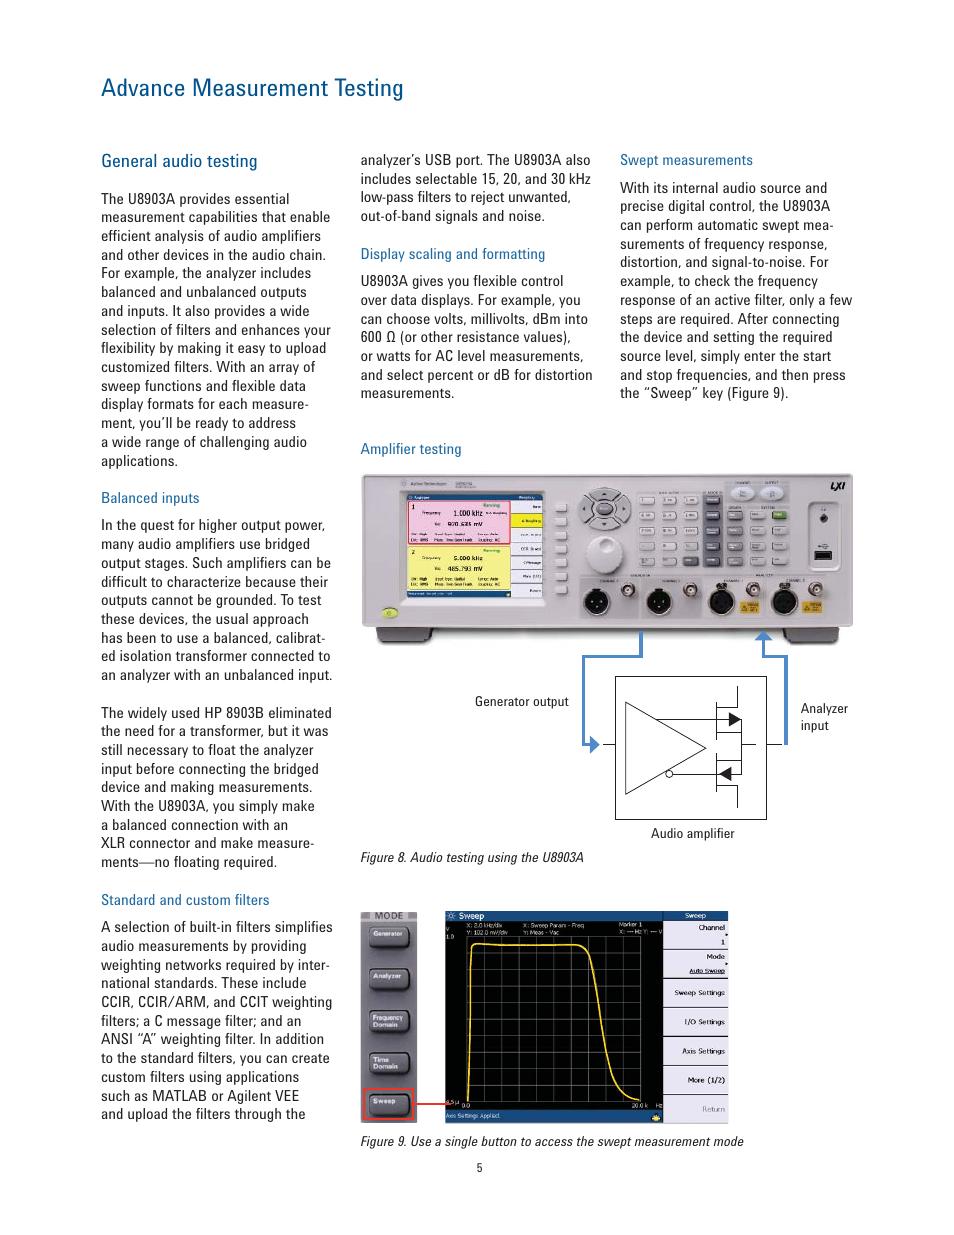 Advance measurement testing | Atec Agilent-U8903A User Manual | Page